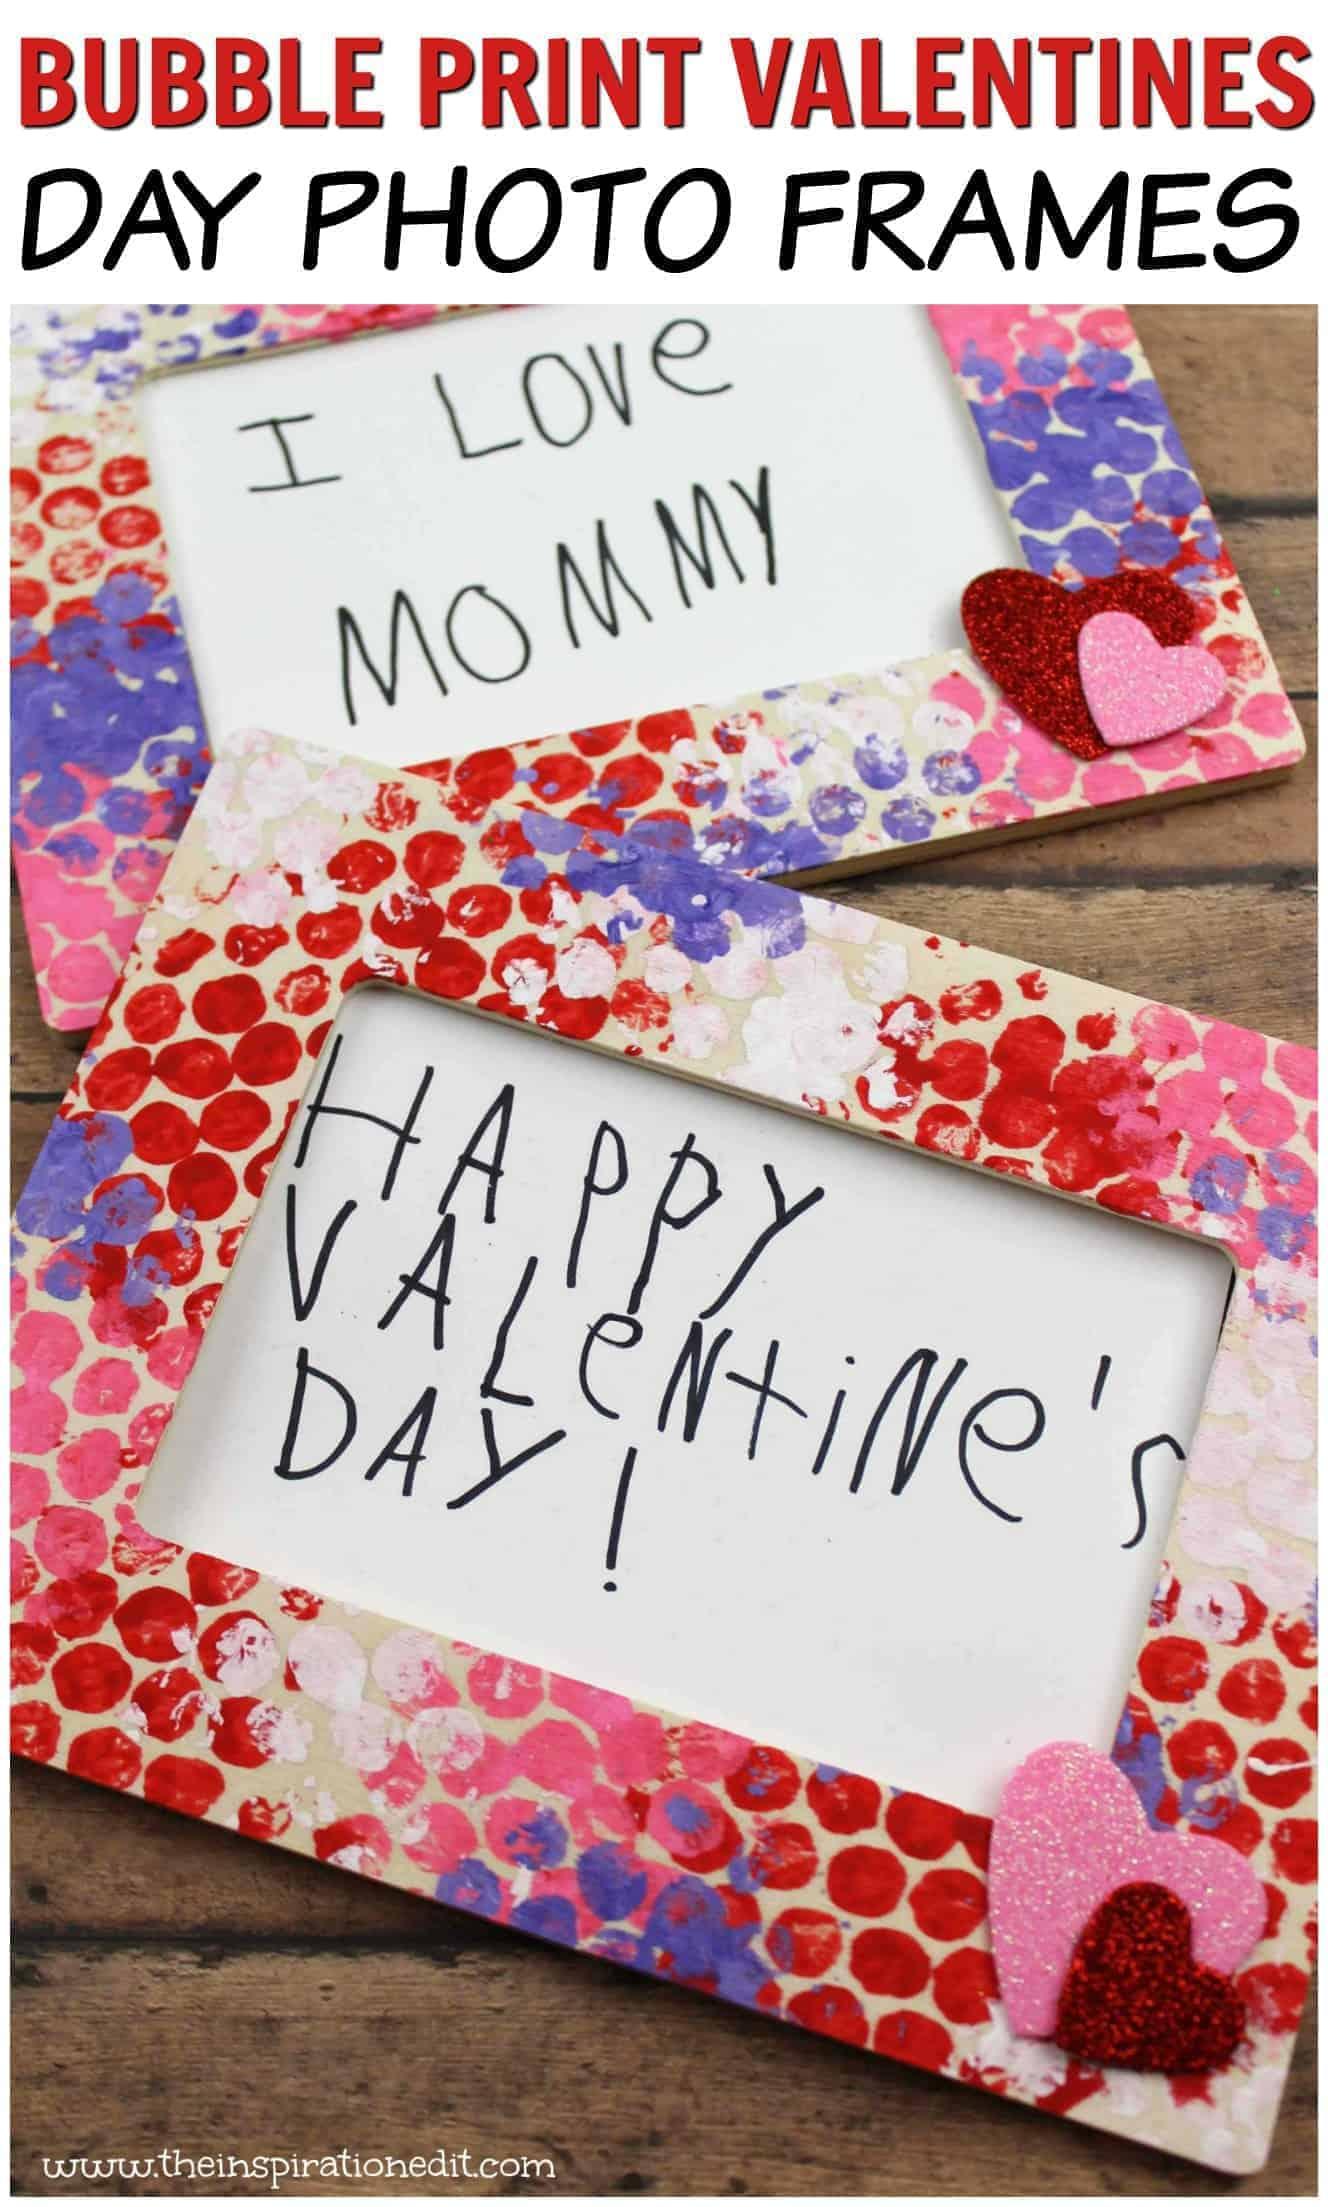 Valentines Bubble Art photo frame